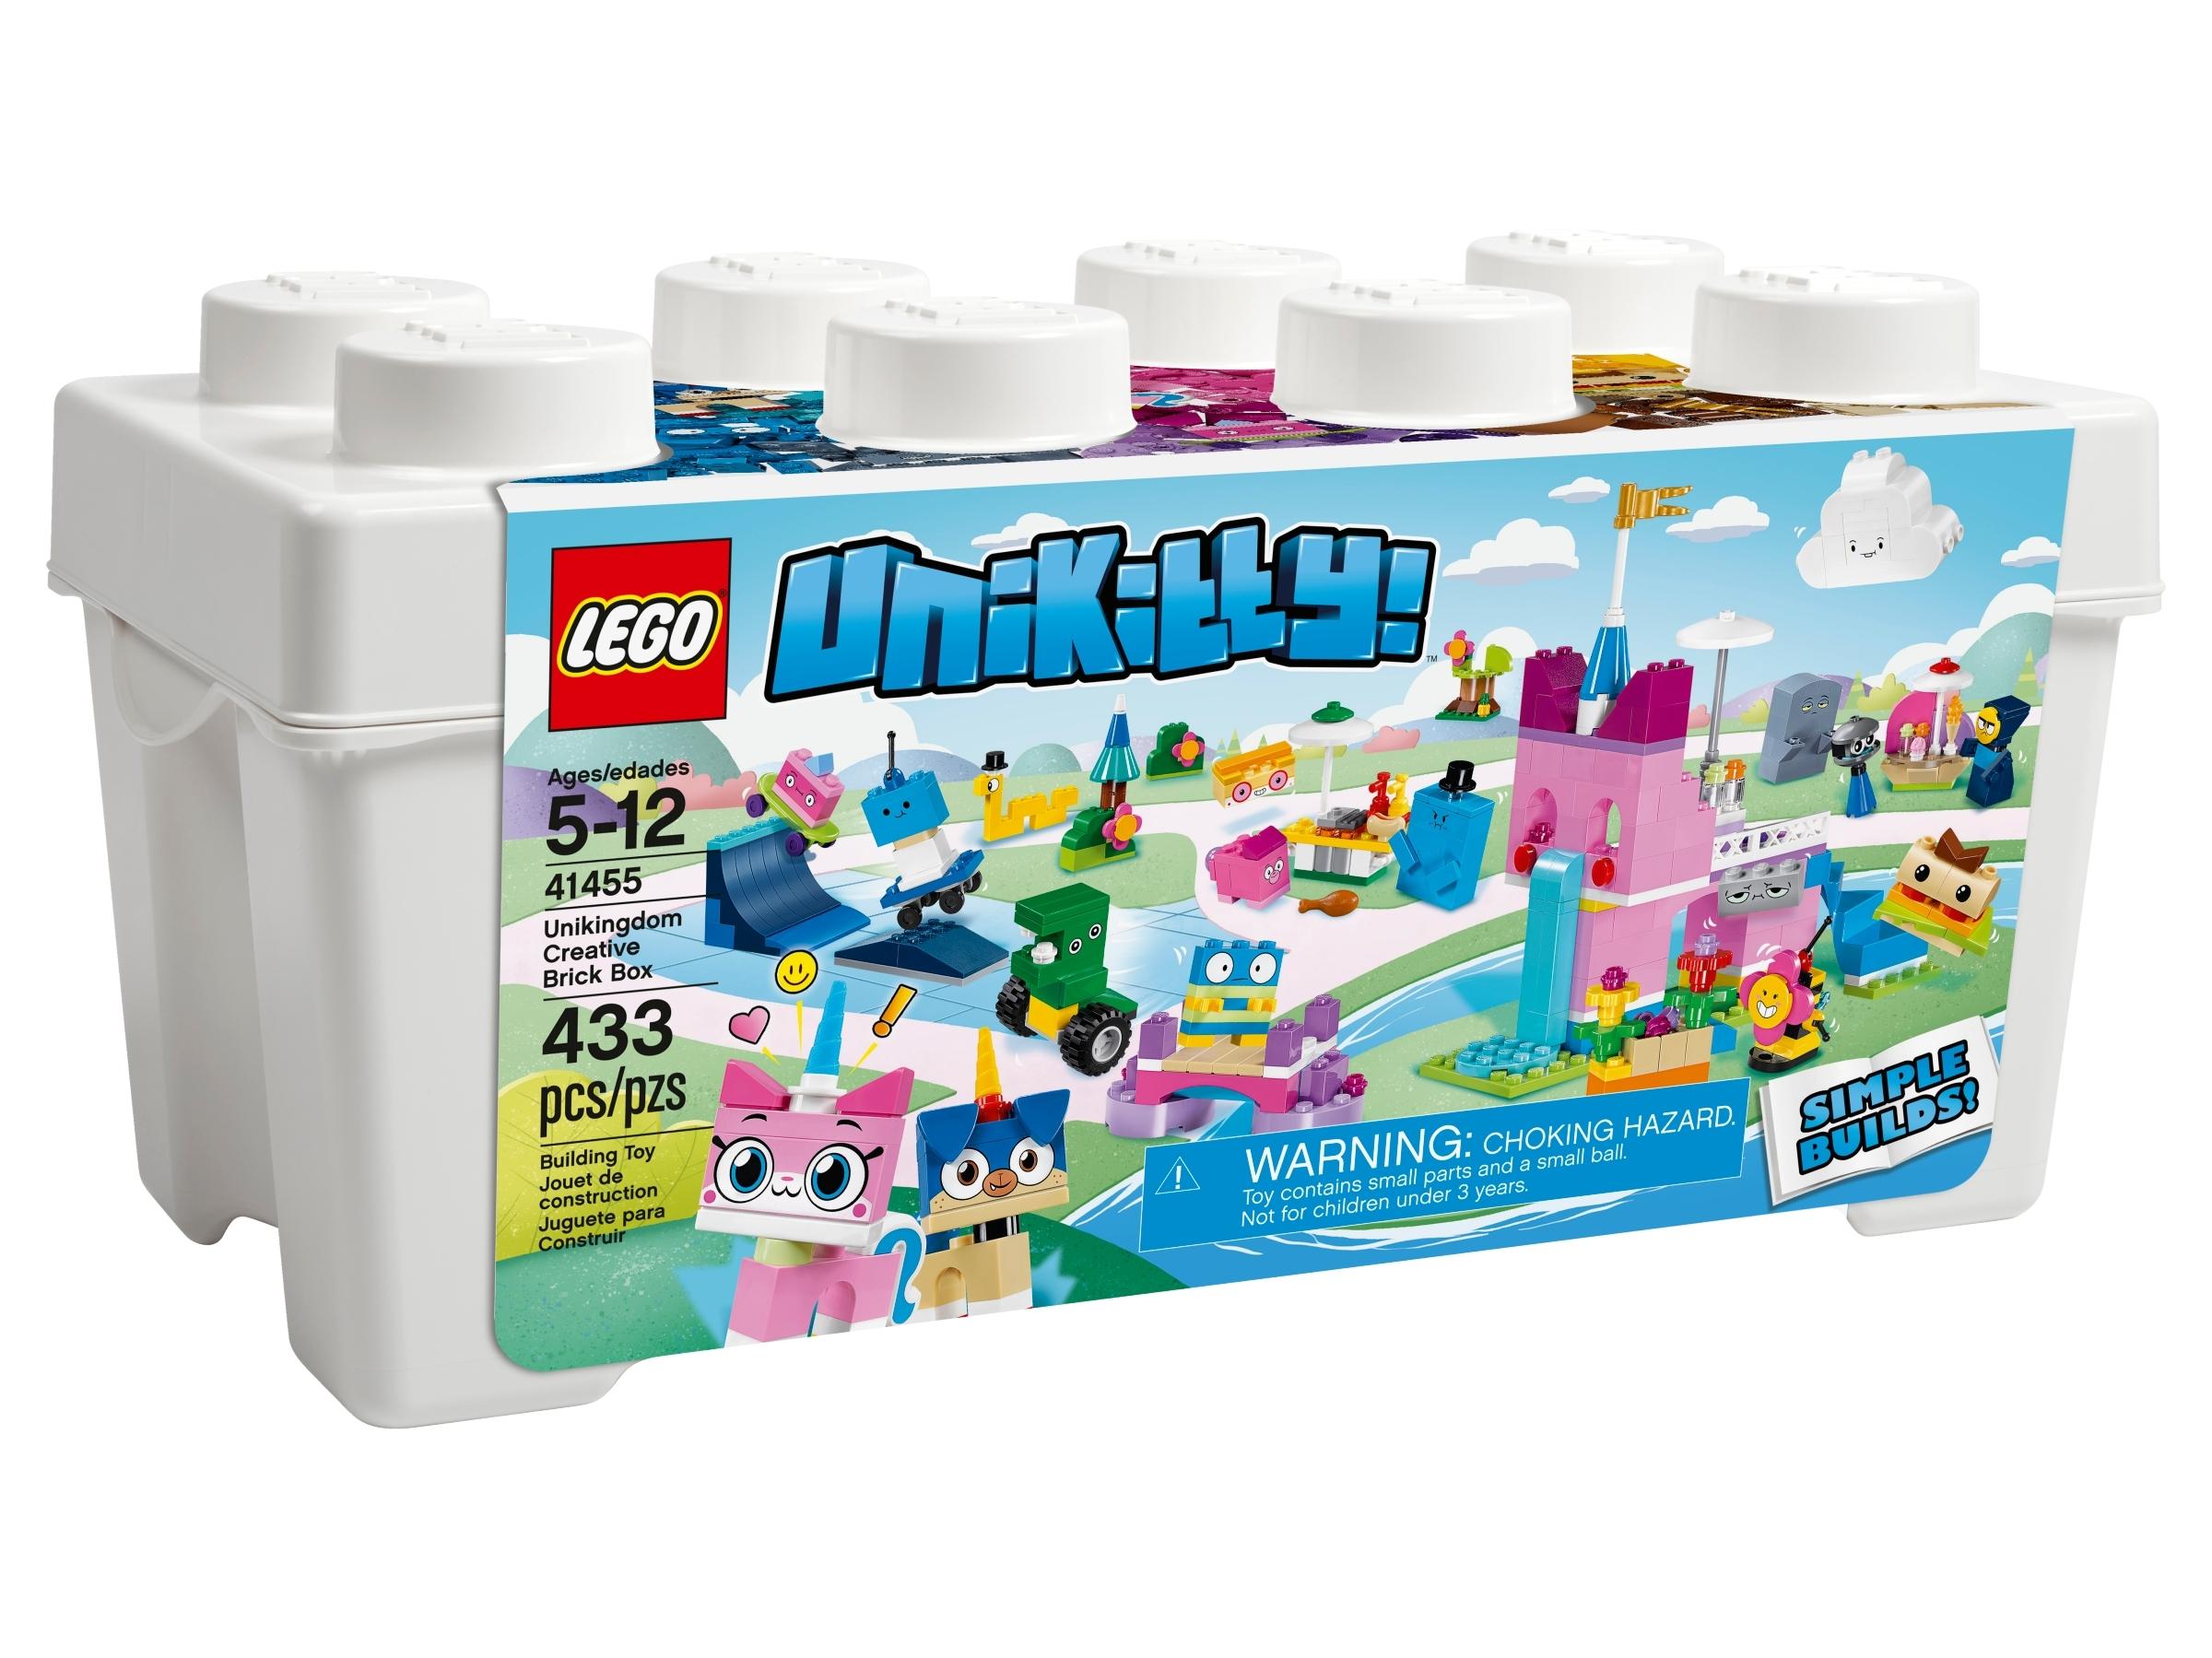 LEGO Sssnake mini fig New Minifigure Only 41455 Unikitty Unikingdom